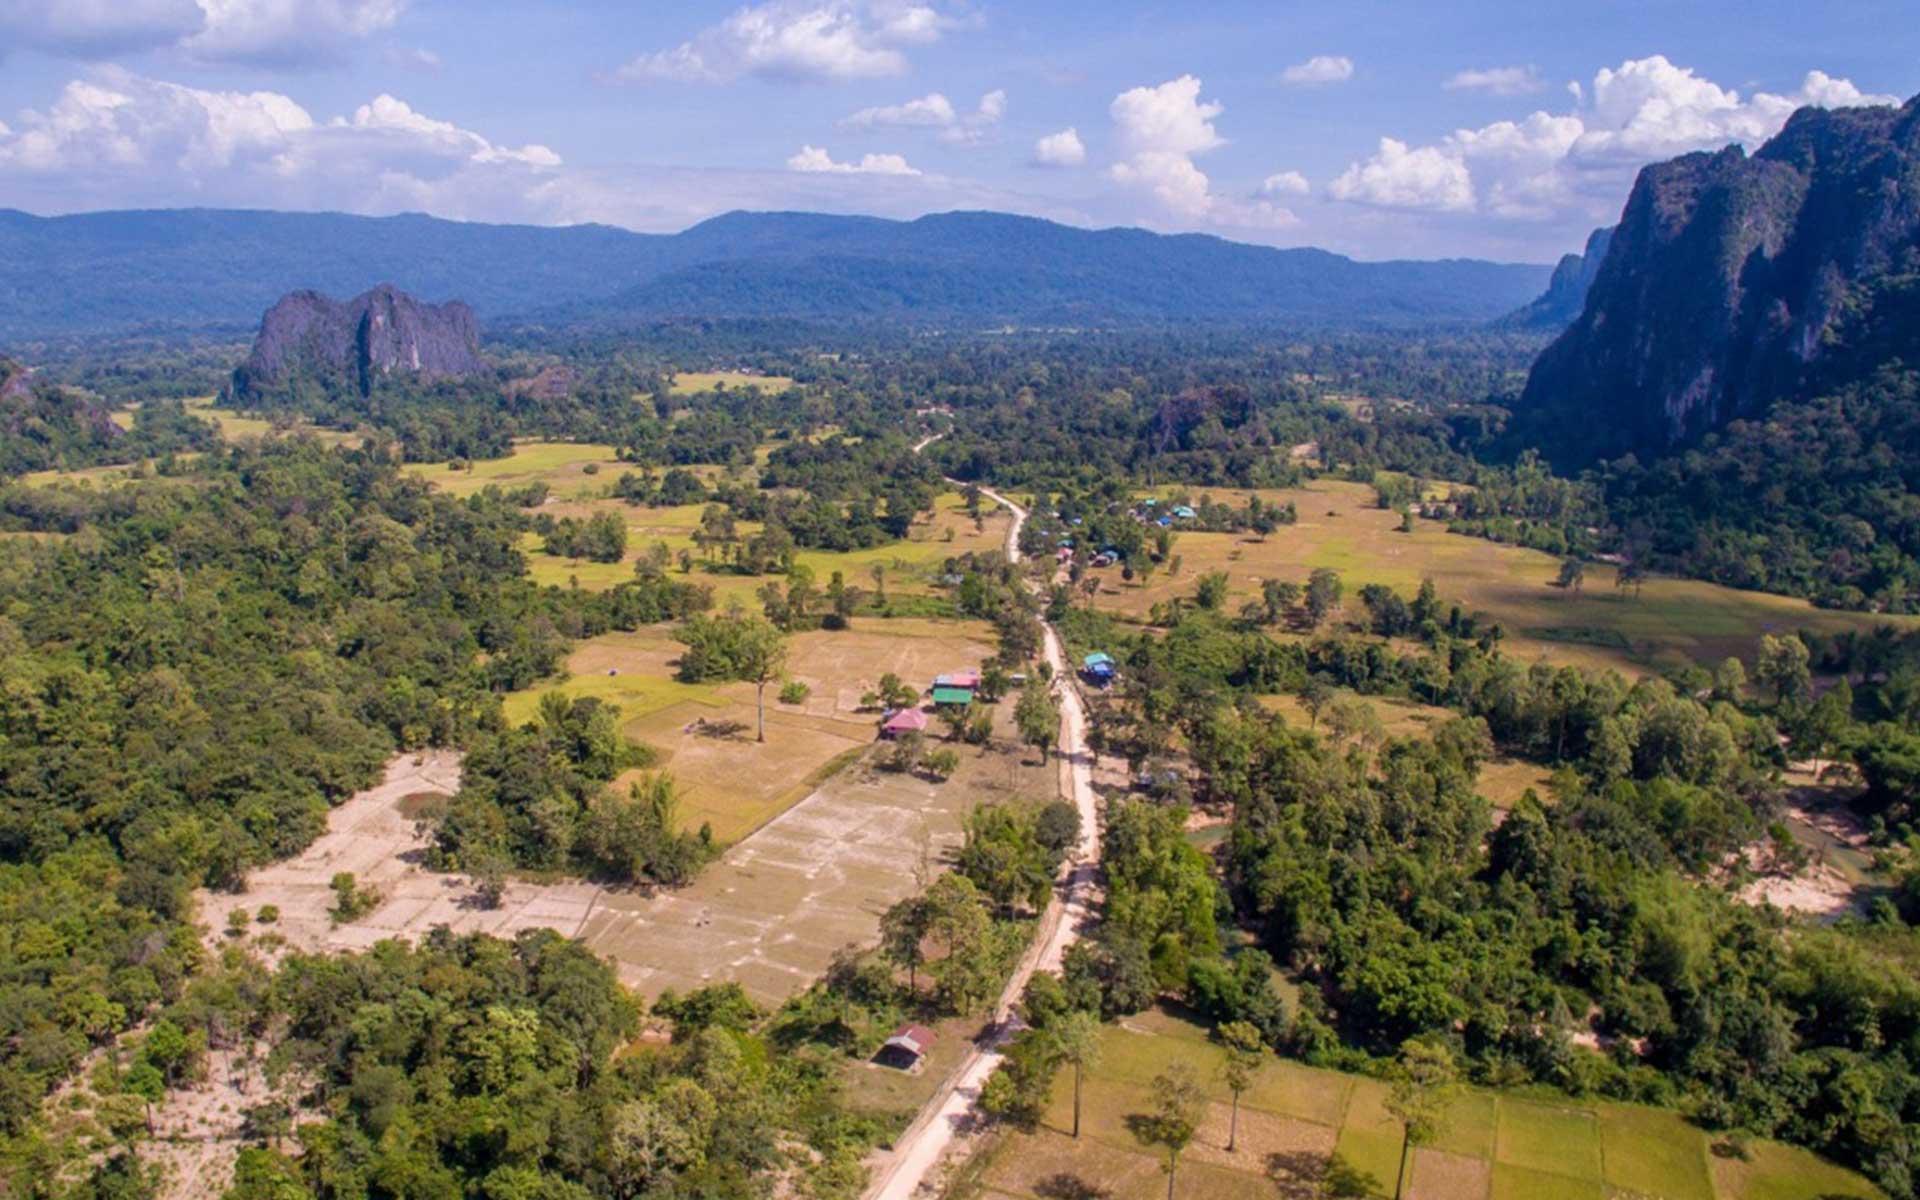 LAOS Laotravel 13 Laos Travel